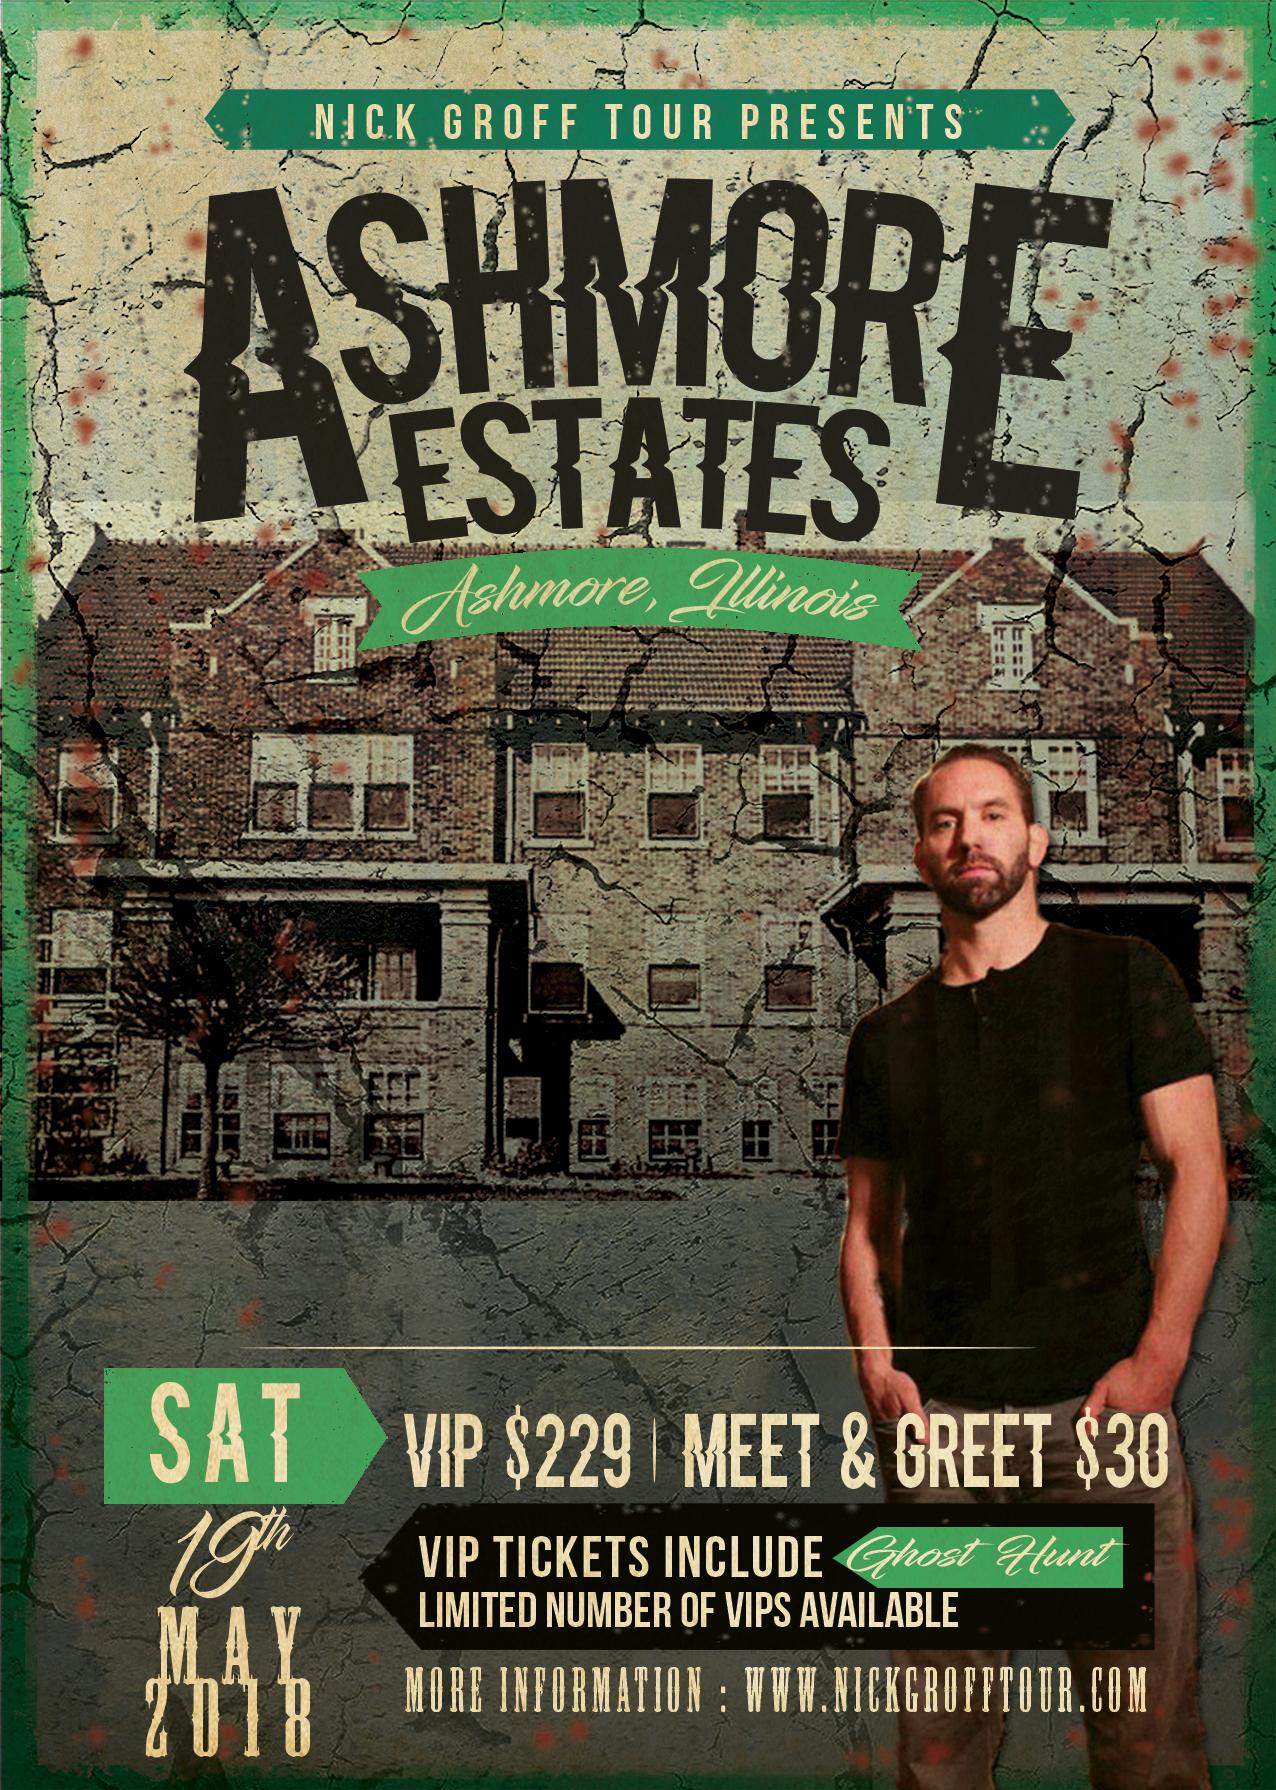 NGT-Ashmore 2018-poster.png